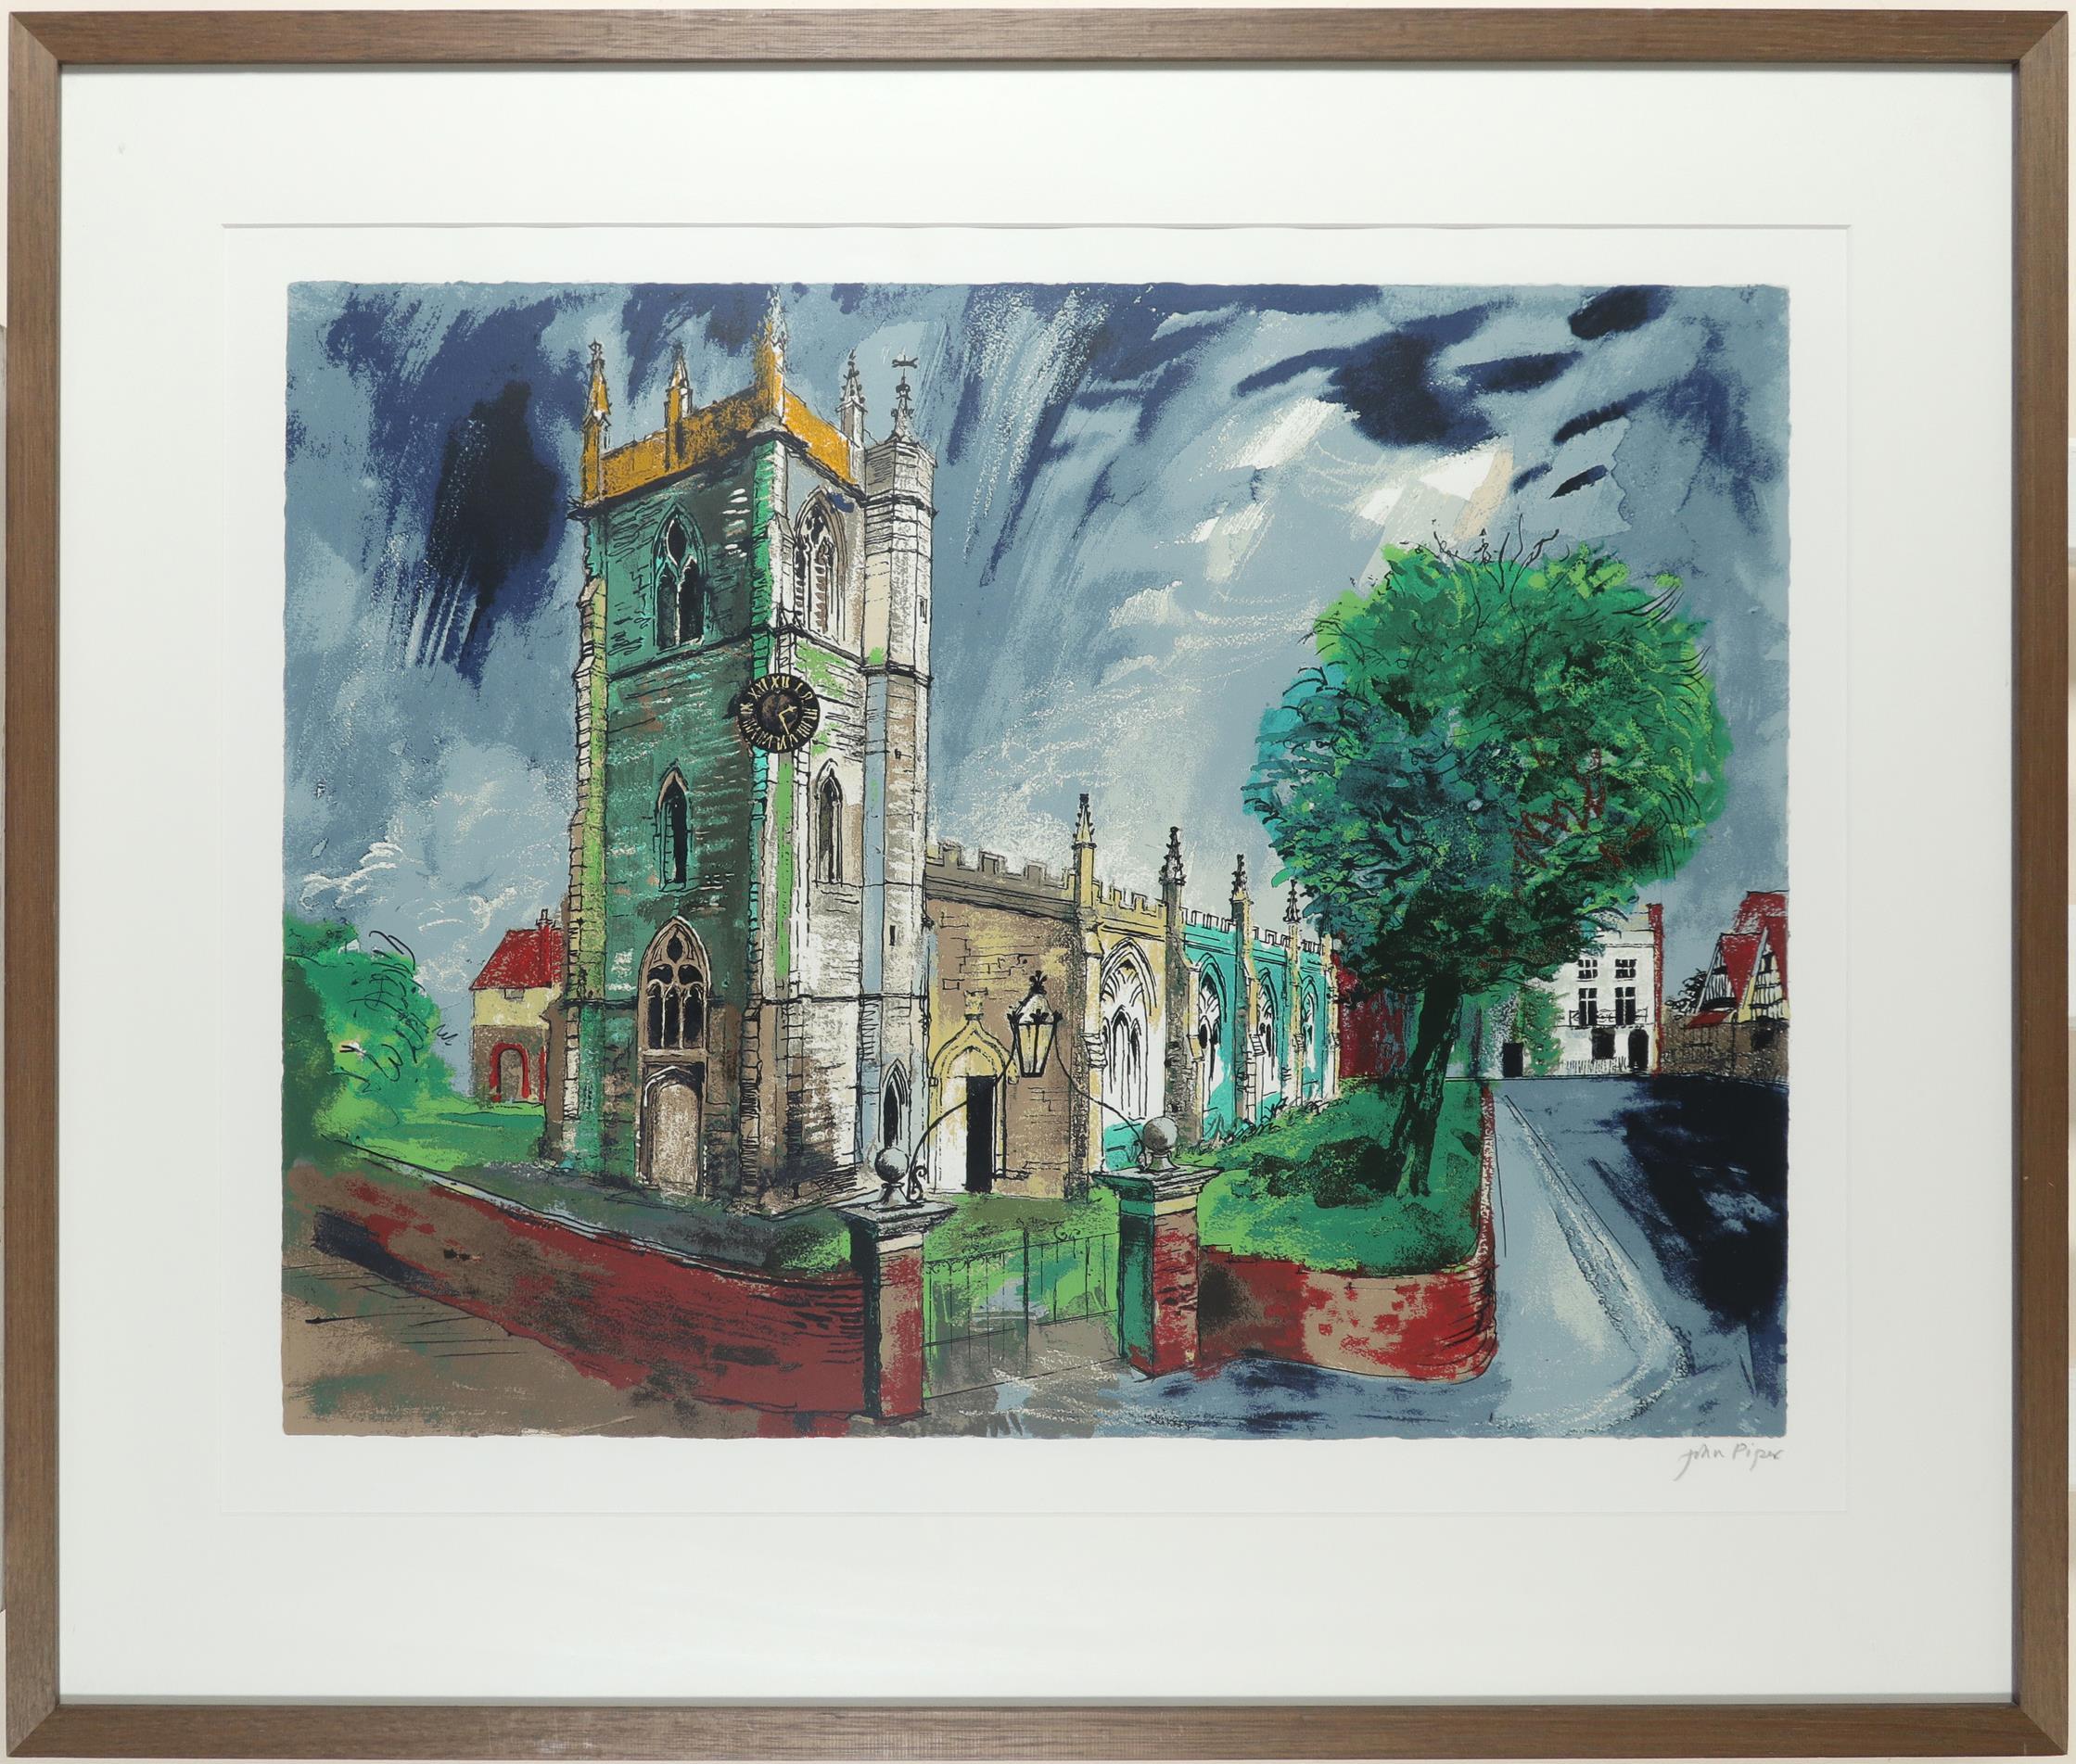 ‡John Piper CH (1903-1992) St Nicholas, Alcester (Levinson 383) Signed in pencil John Piper (in - Image 2 of 3